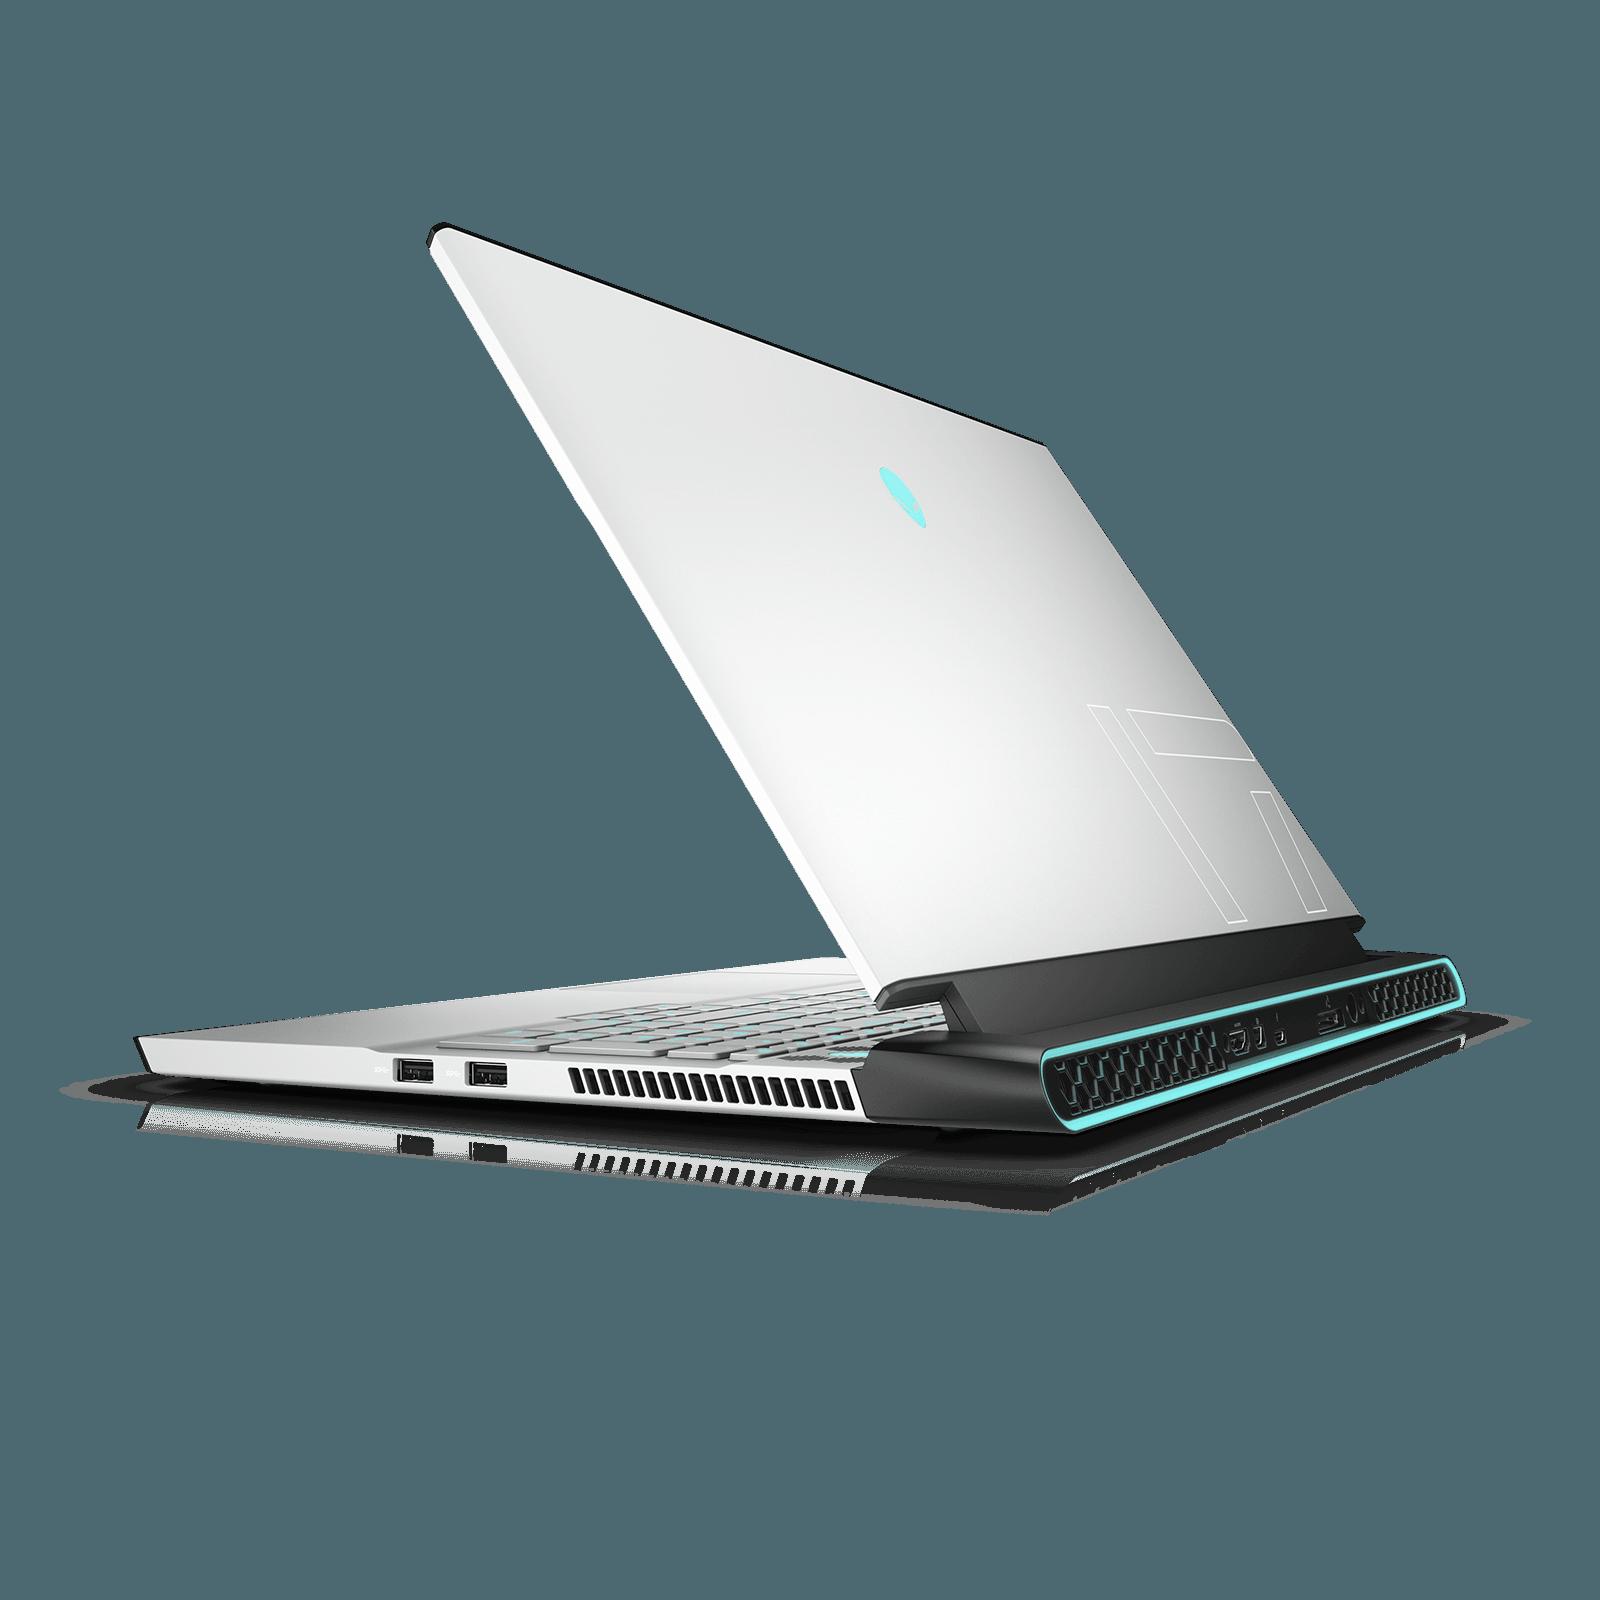 Dell and Alienware unveil a cornucopia of updates at